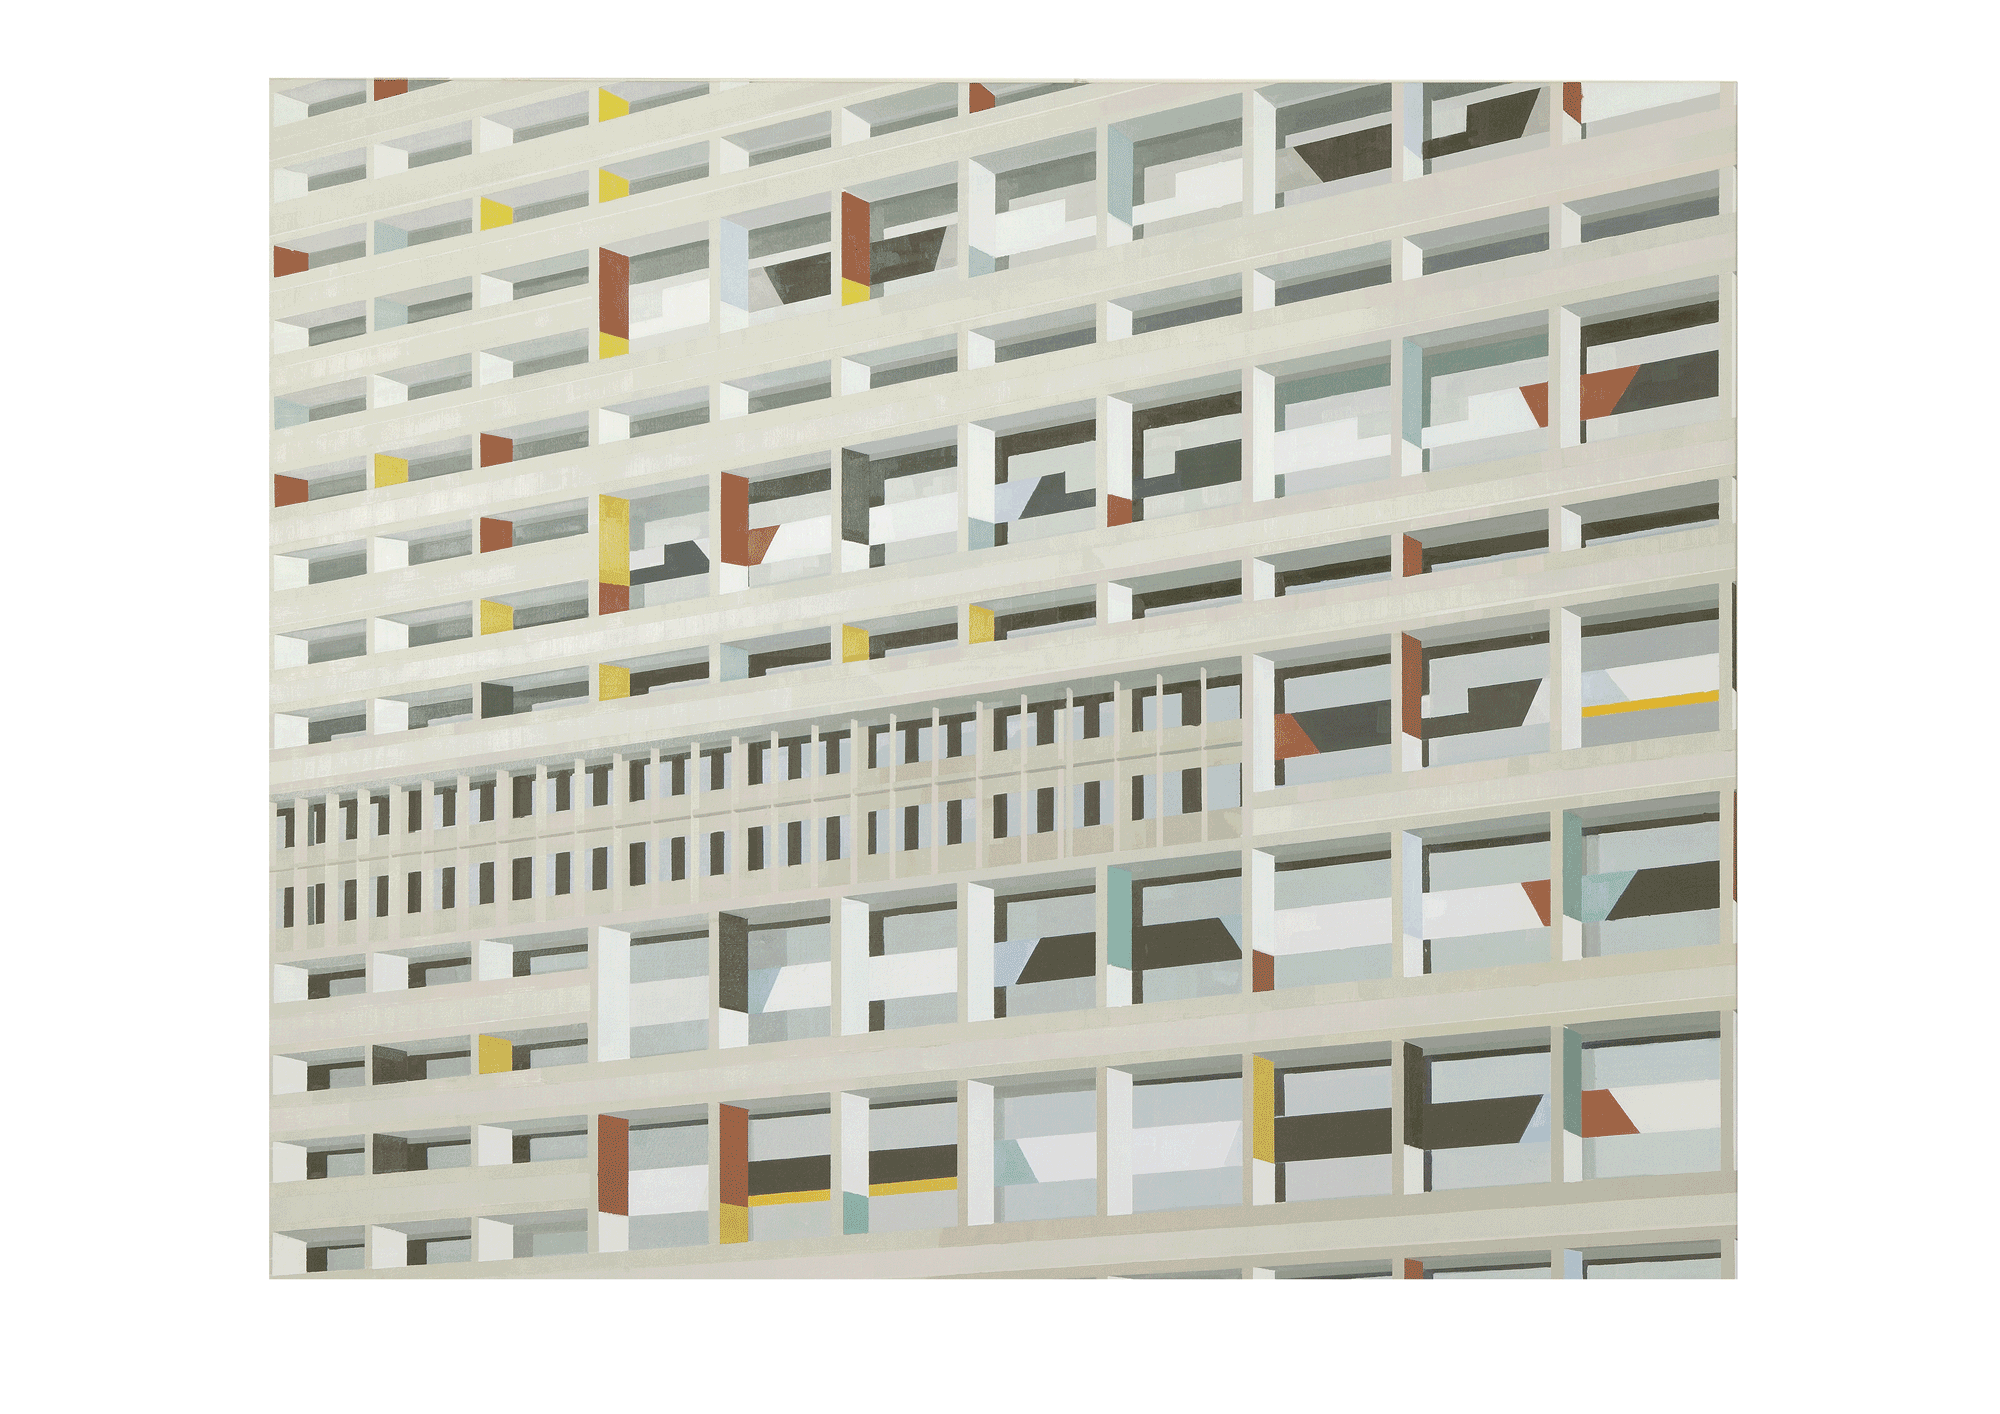 Suyoung Kim Solo Exhibition: Flat Construction